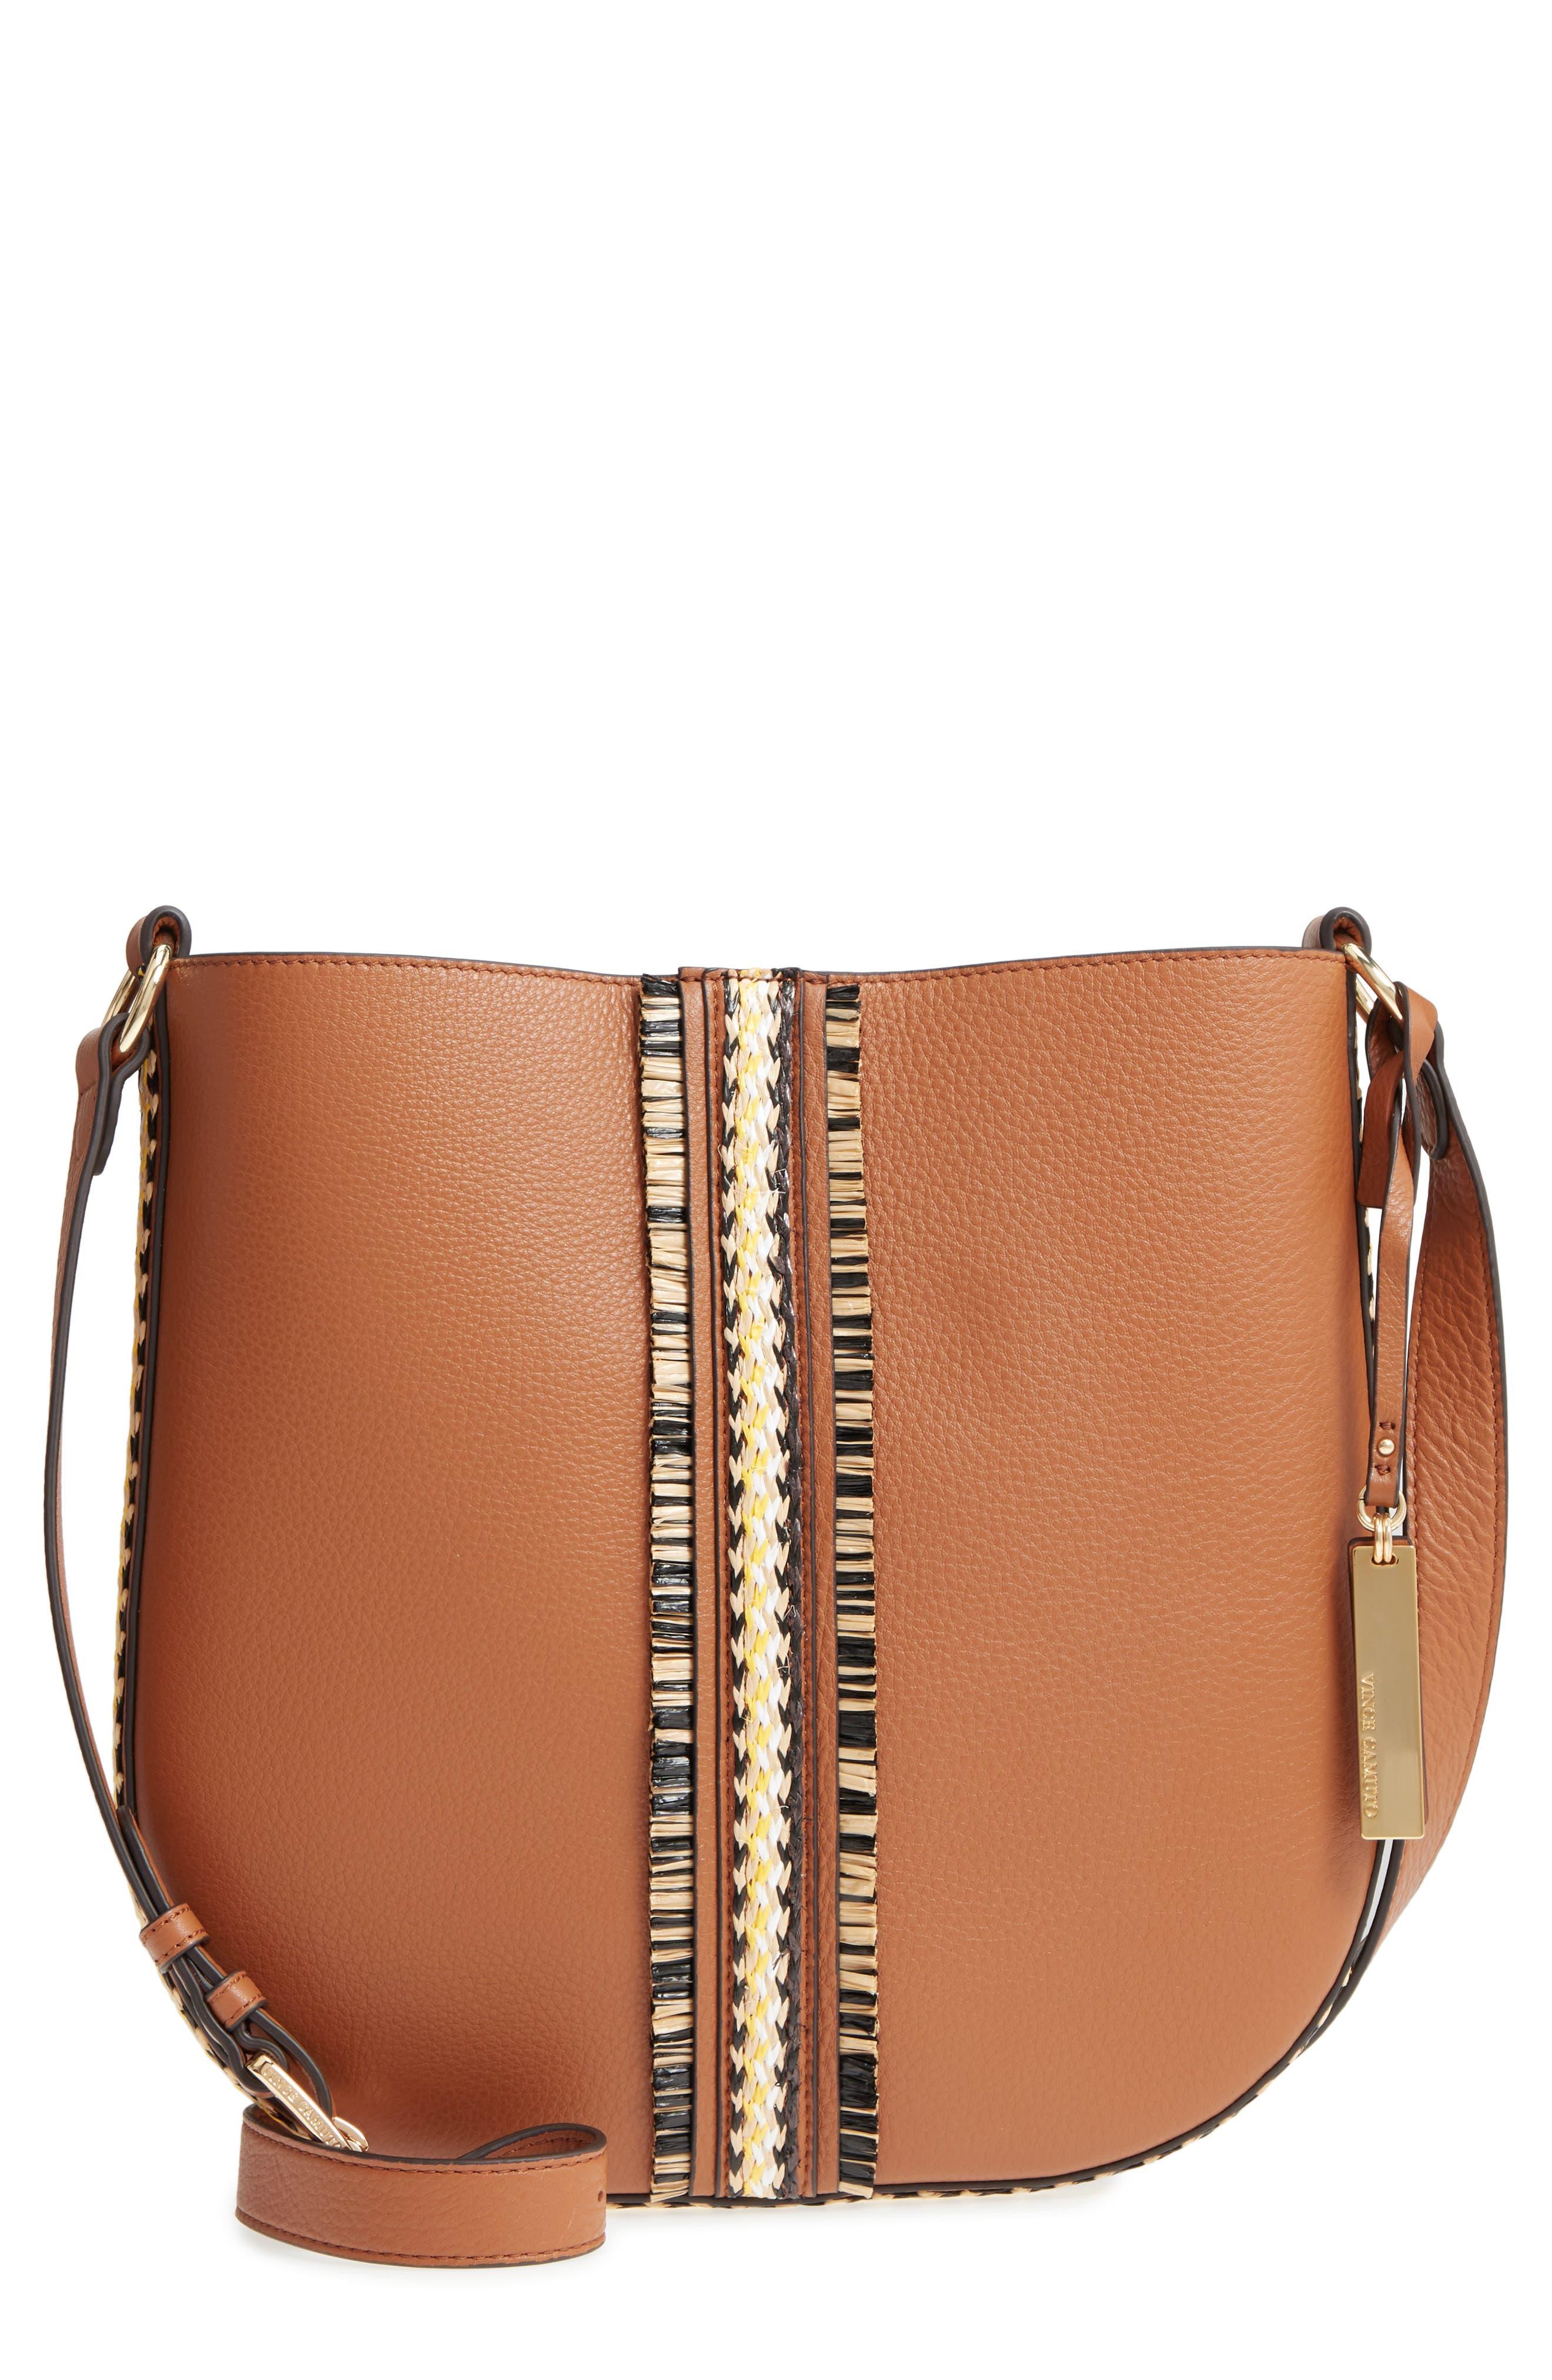 Crossbody Bag,                         Main,                         color, Spiced Brown